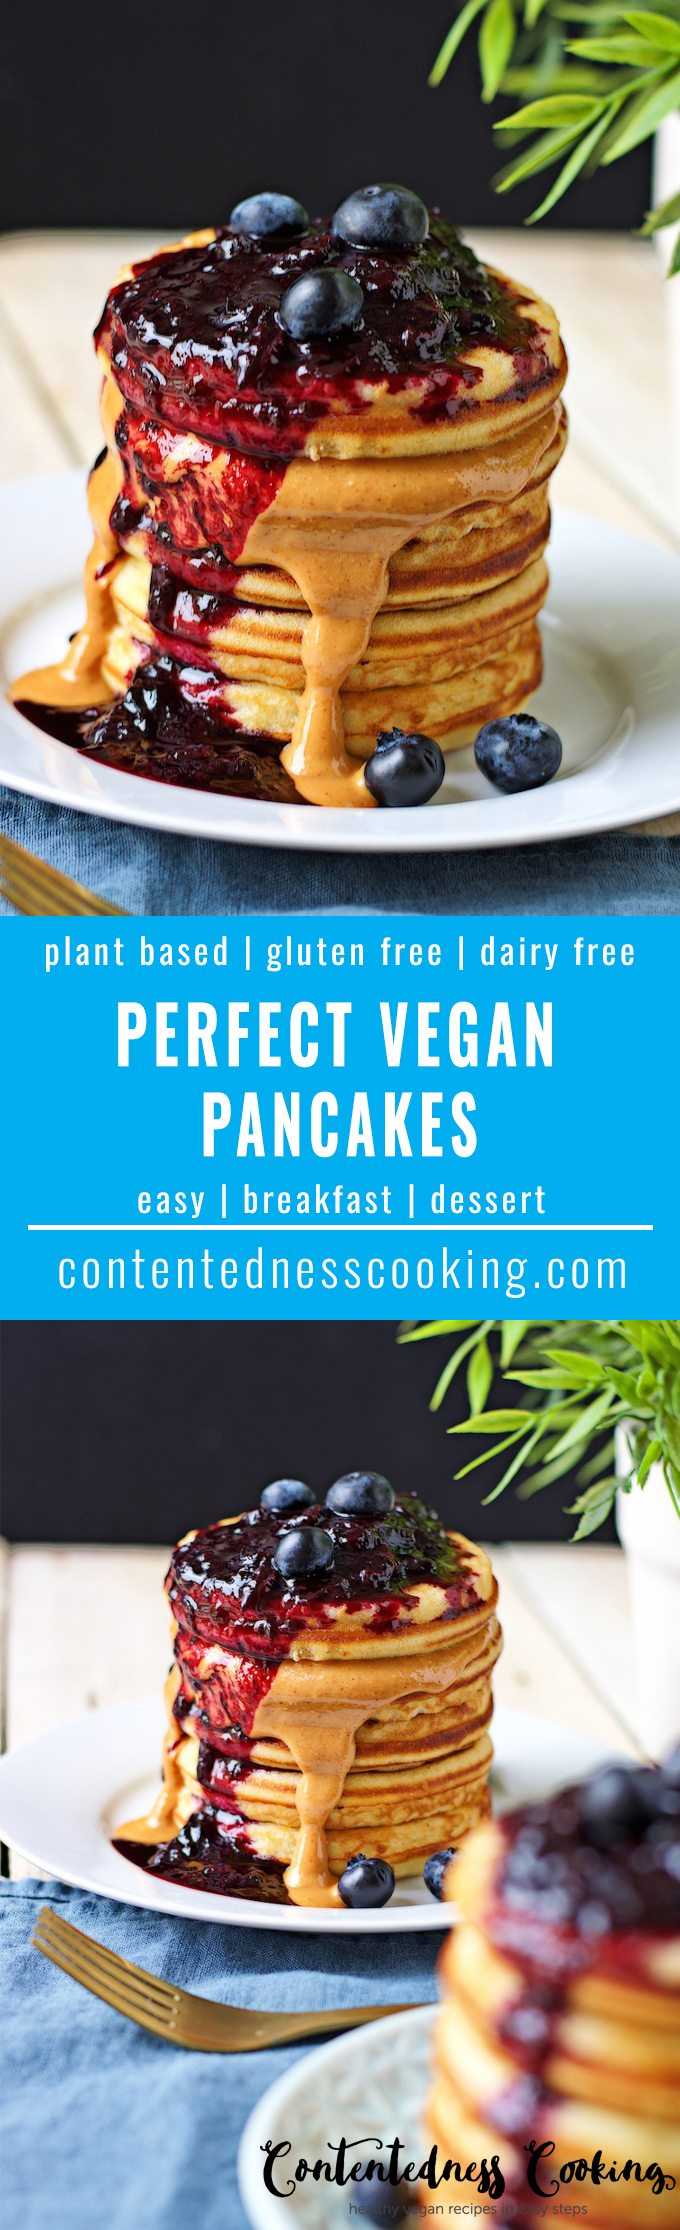 Perfect Vegan Pancakes | #vegan #contentednescooking #glutenfree